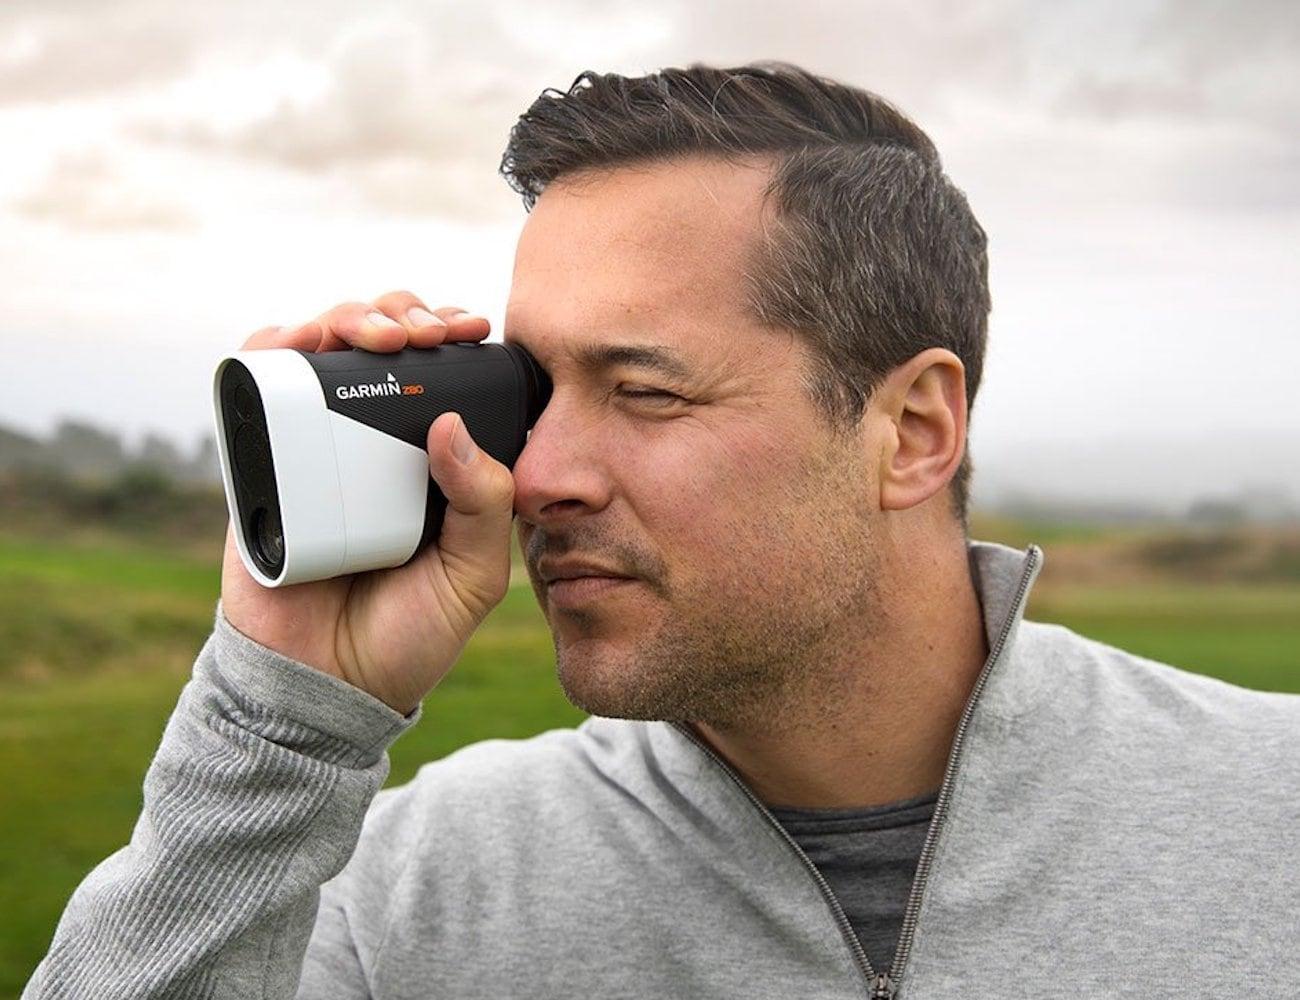 Garmin Approach Z80 Golf GPS Laser Range Finder helps your game